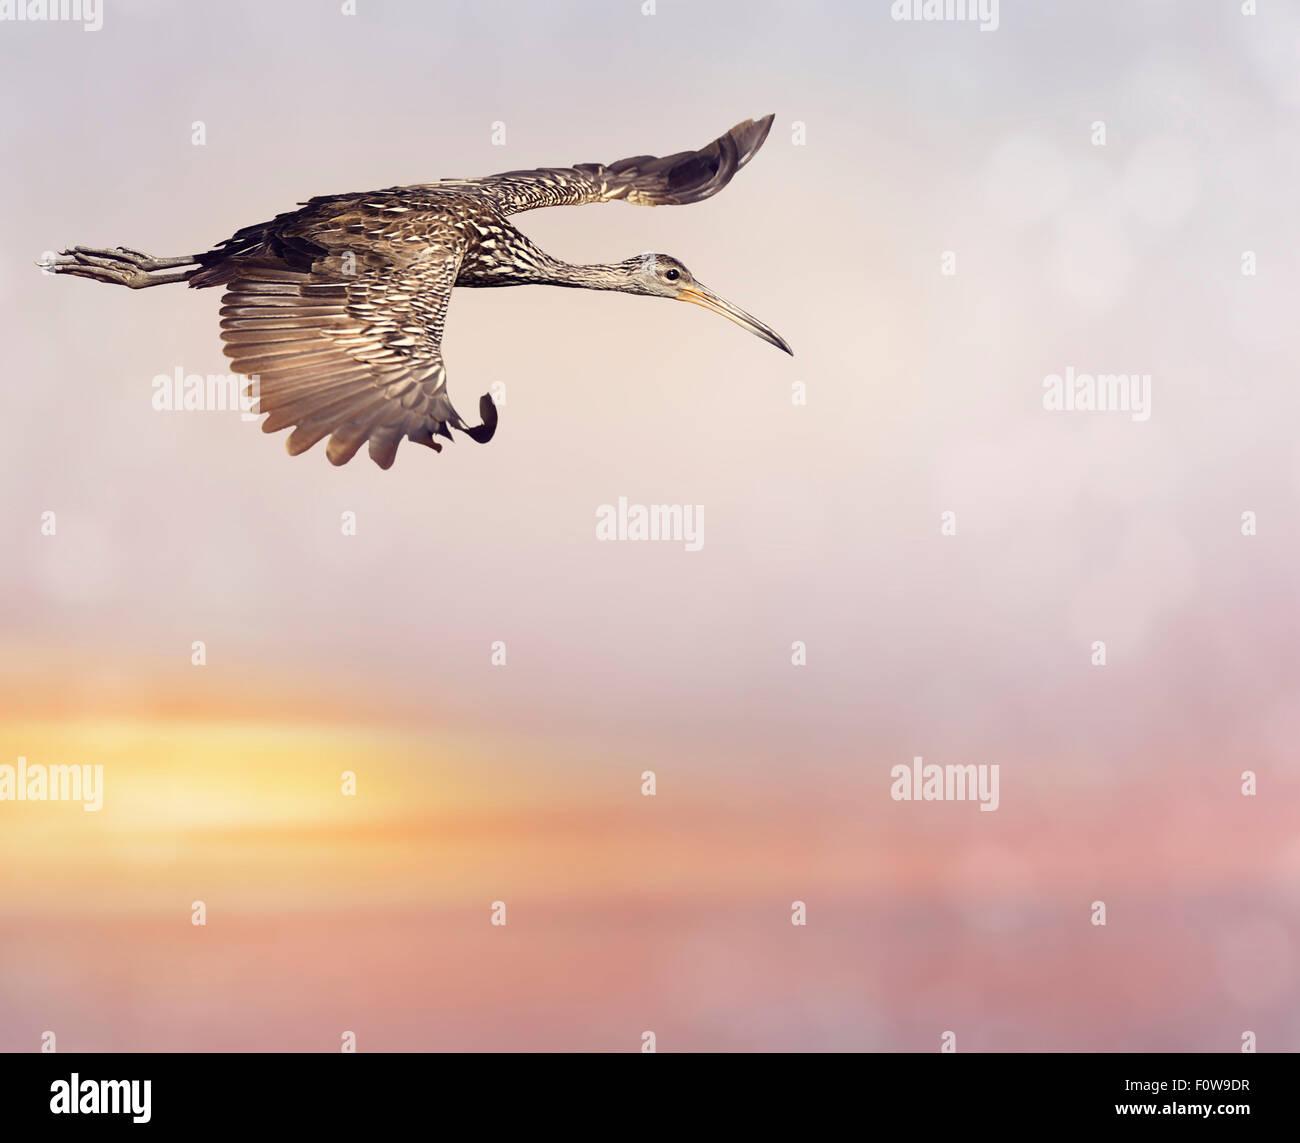 Limpkin pájaro en pleno vuelo al atardecer Imagen De Stock